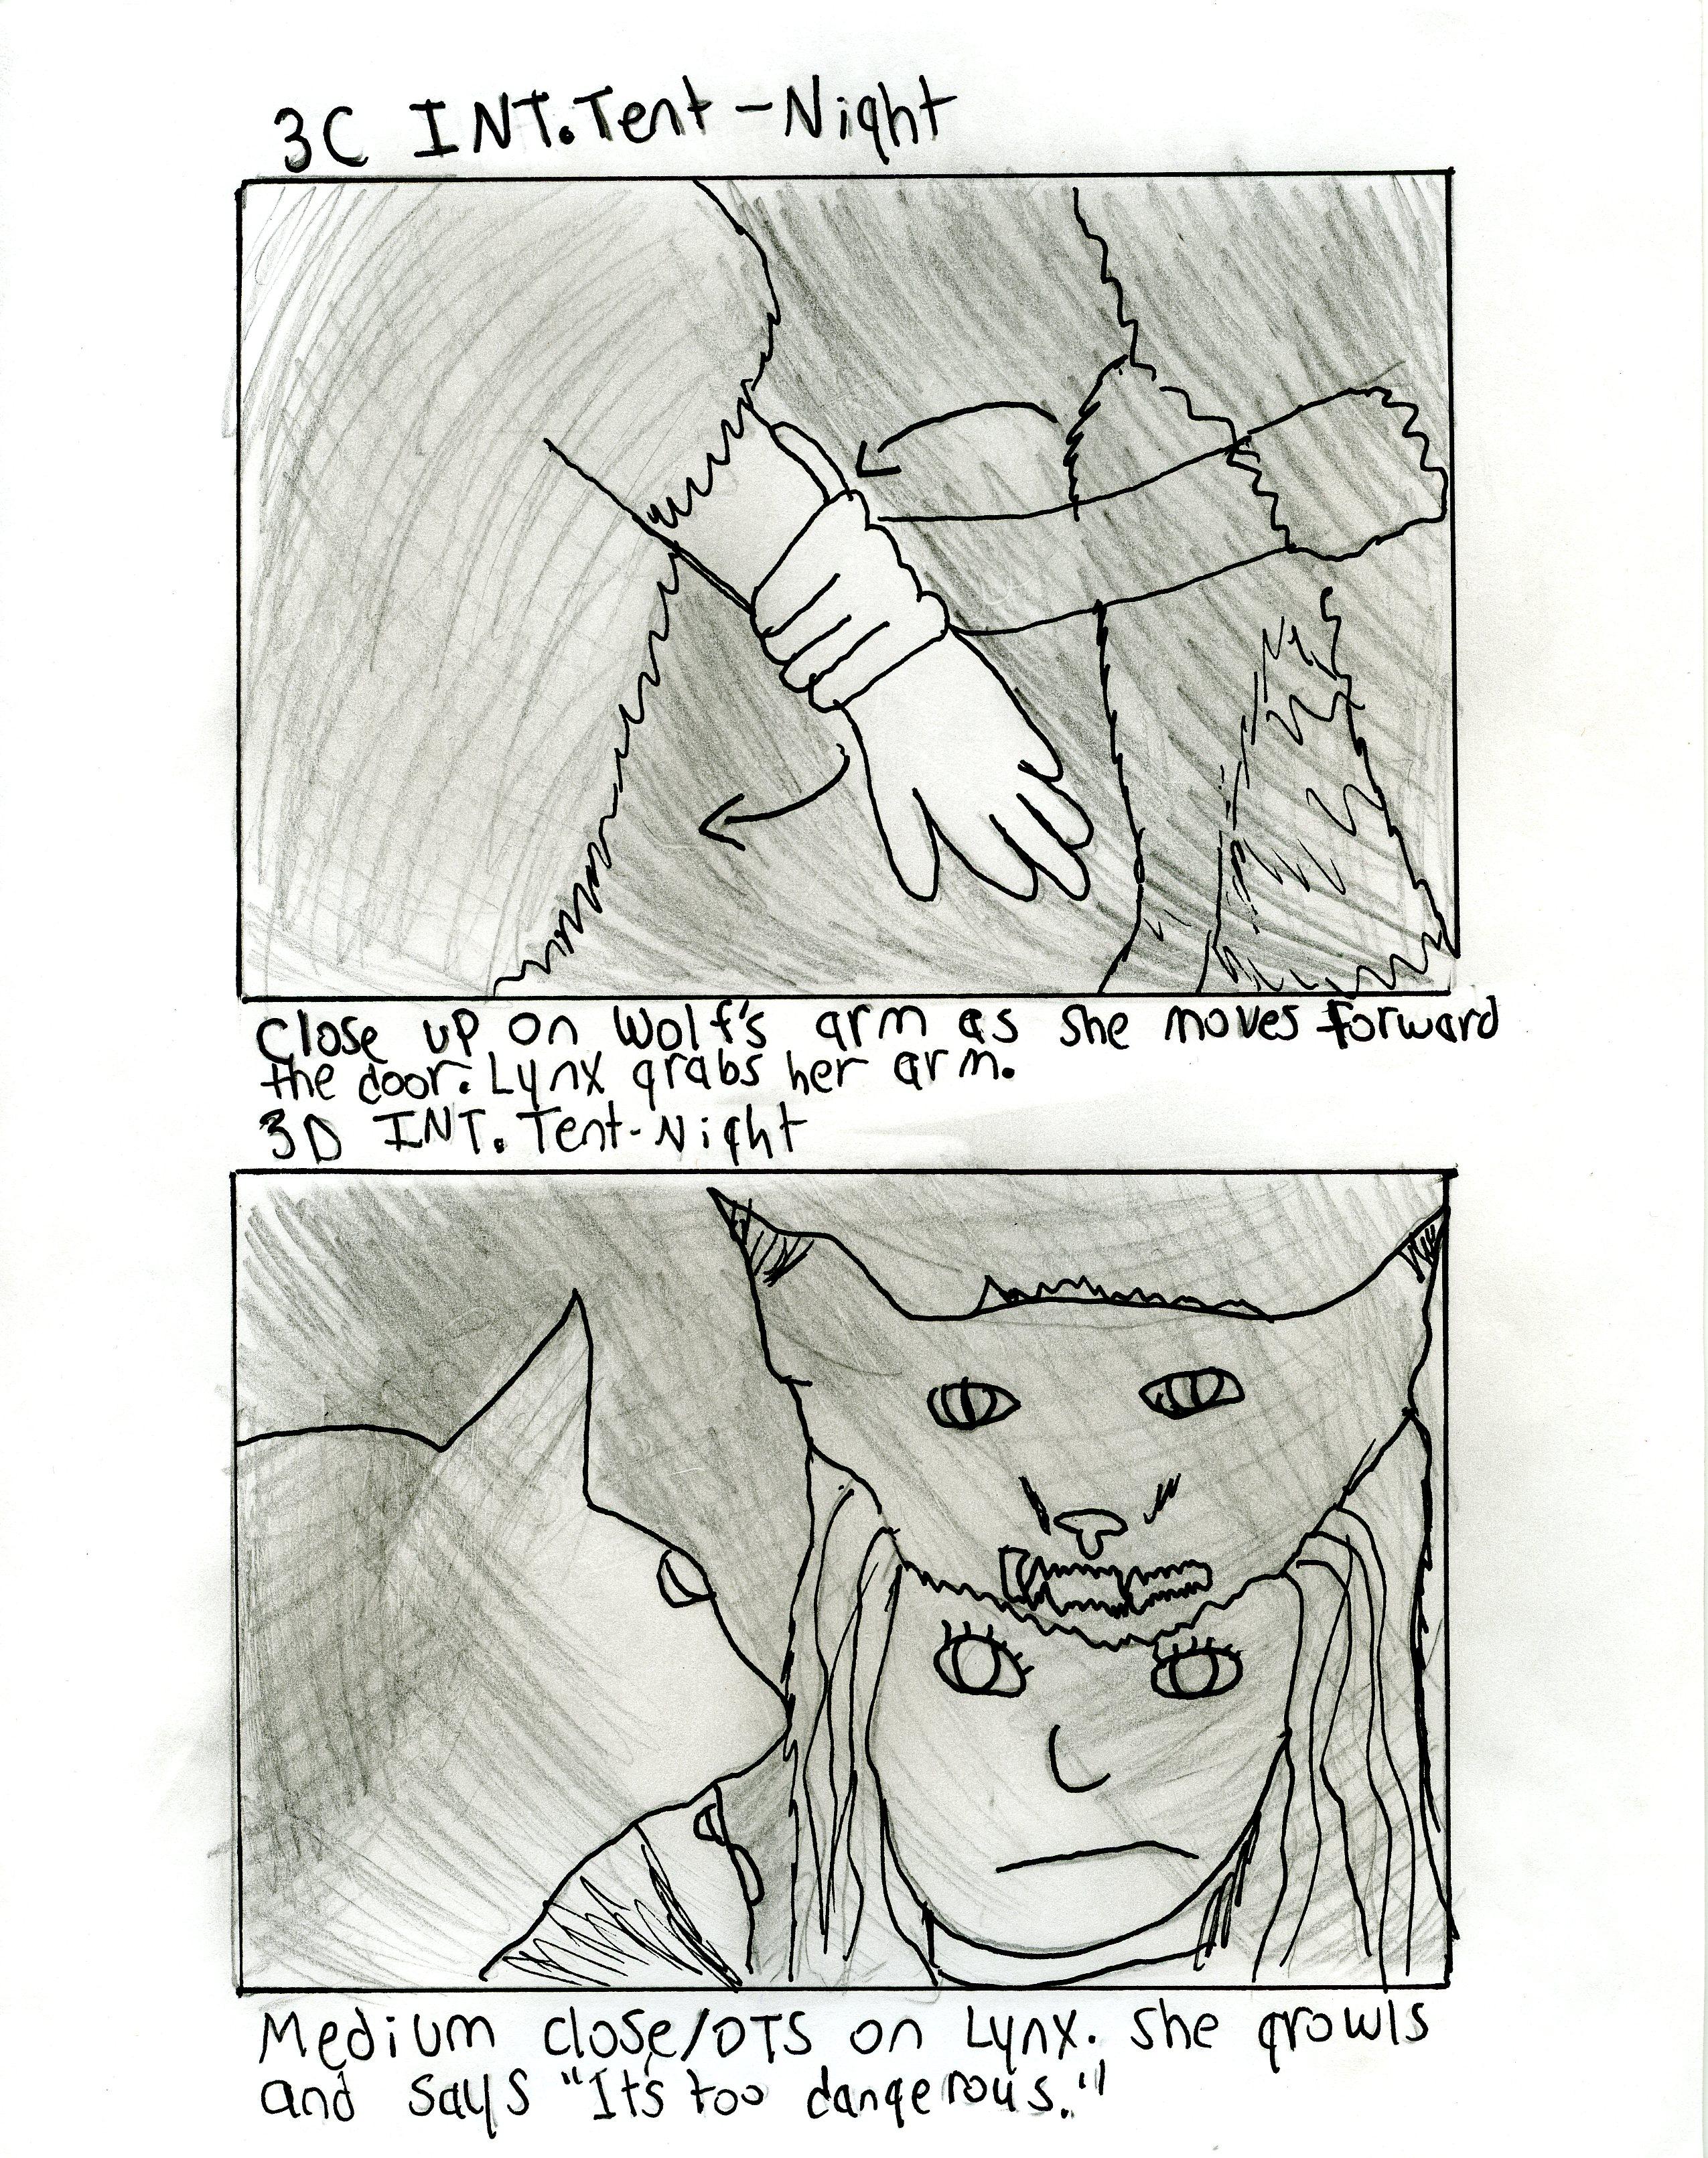 Baf Wolf Eats Lynx